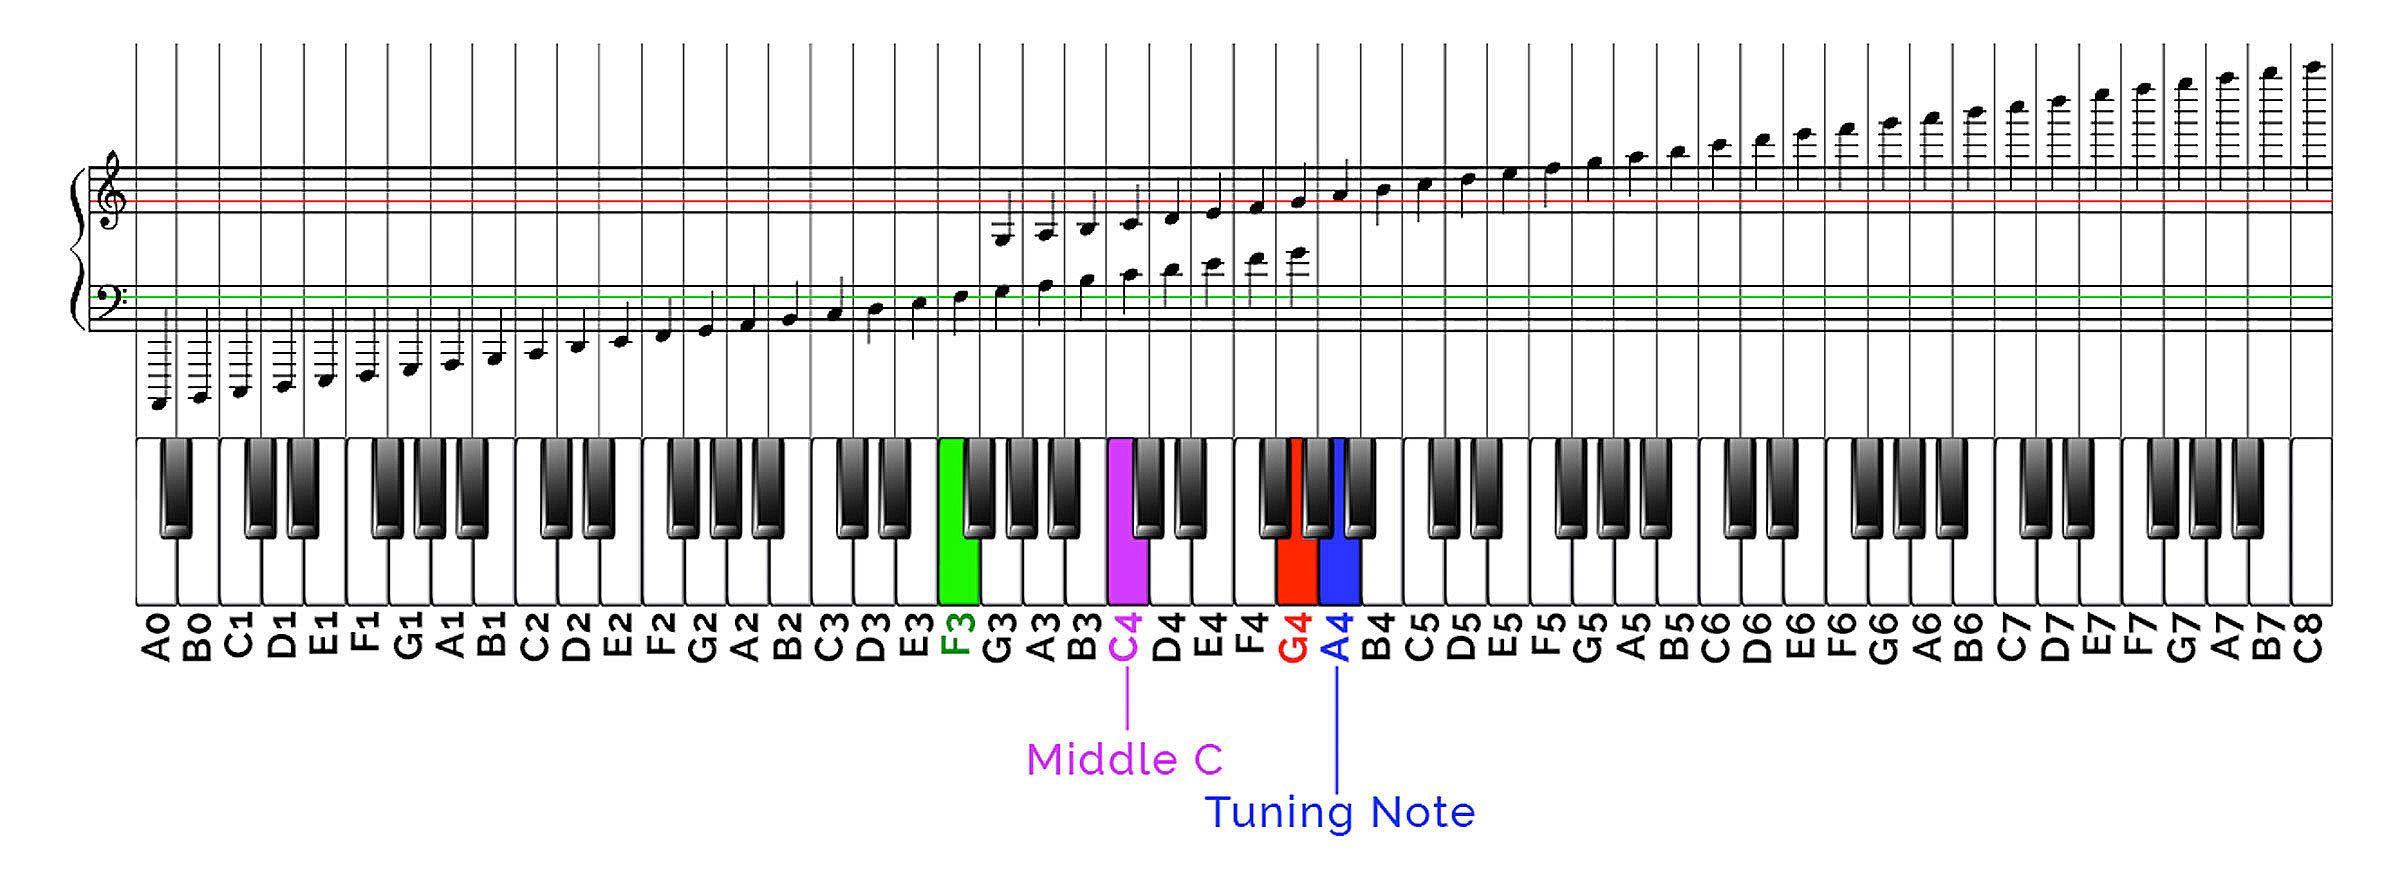 Piano Keys On Sheet Music Google Search Reading Sheet Music Piano Keys And Notes Reading Music